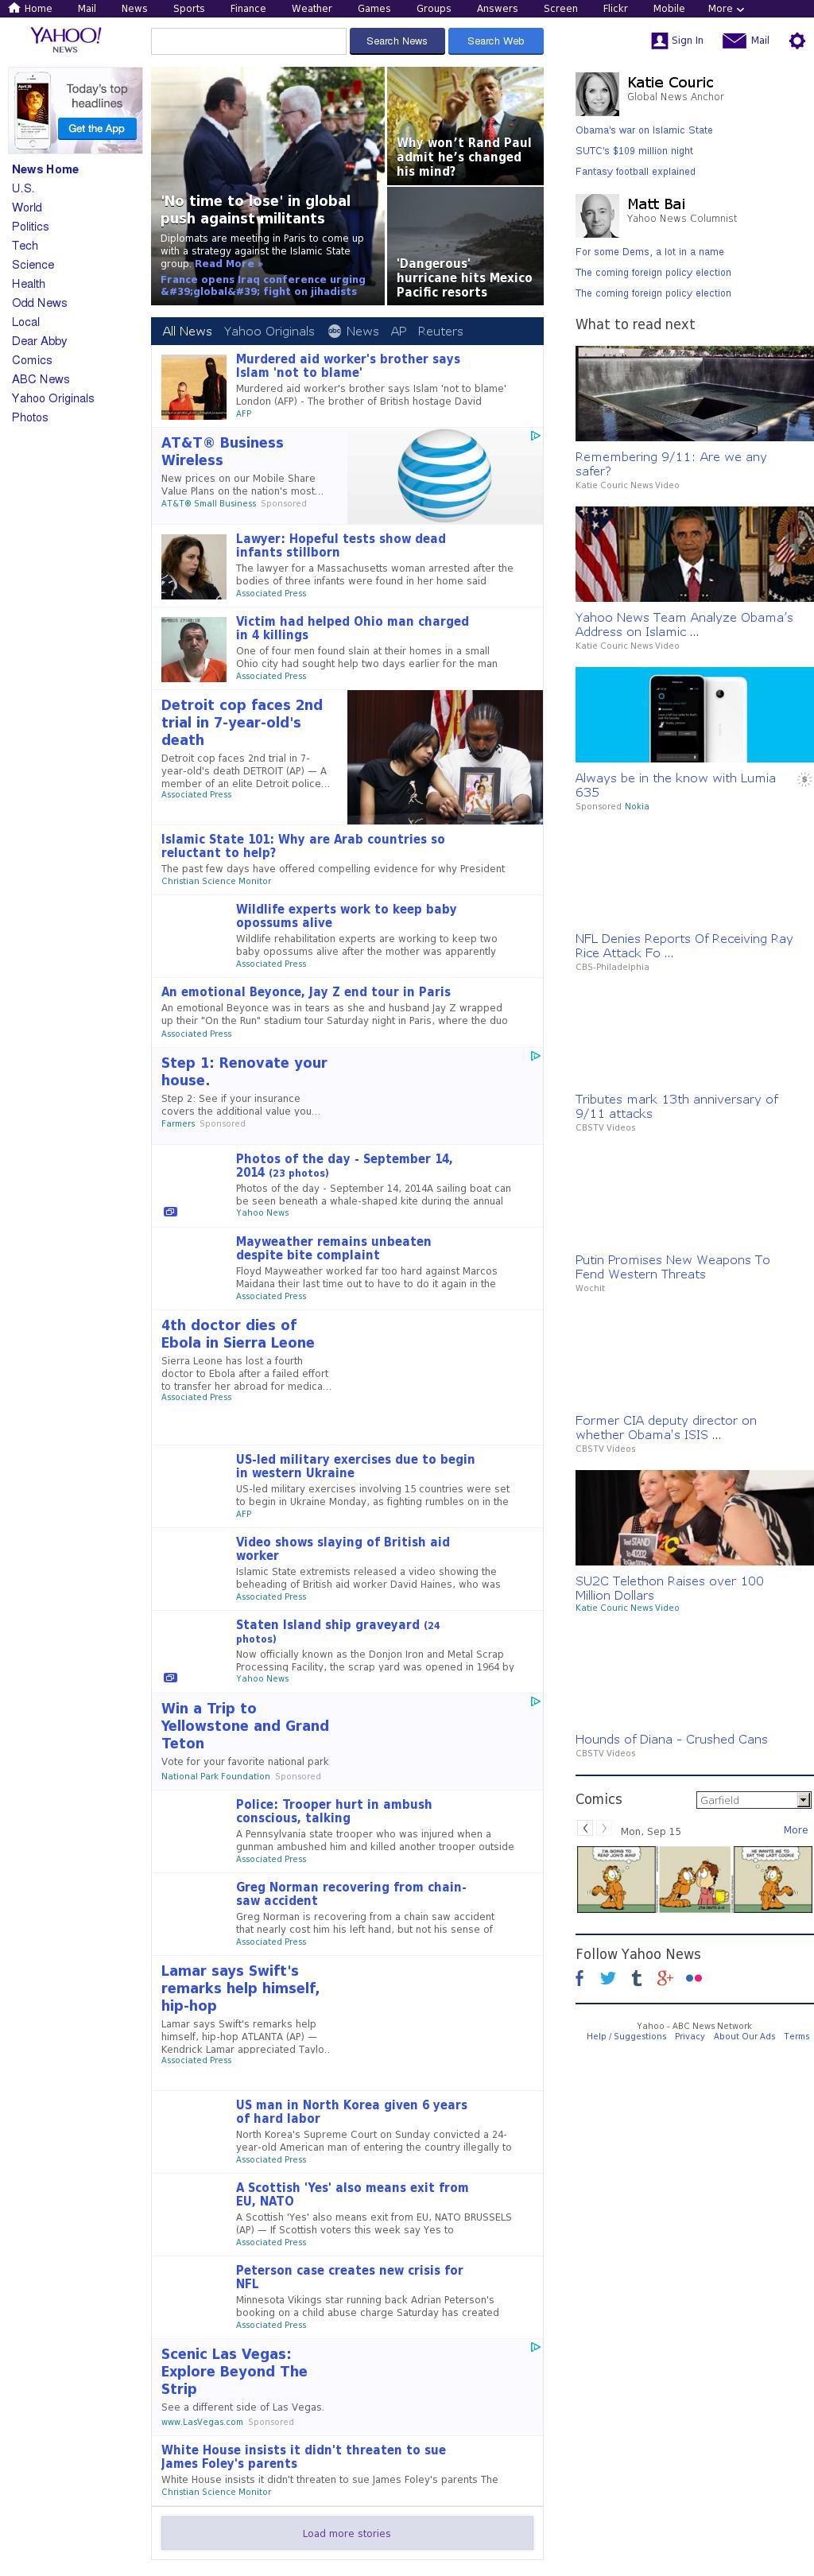 Yahoo! News at Monday Sept. 15, 2014, 9:21 a.m. UTC